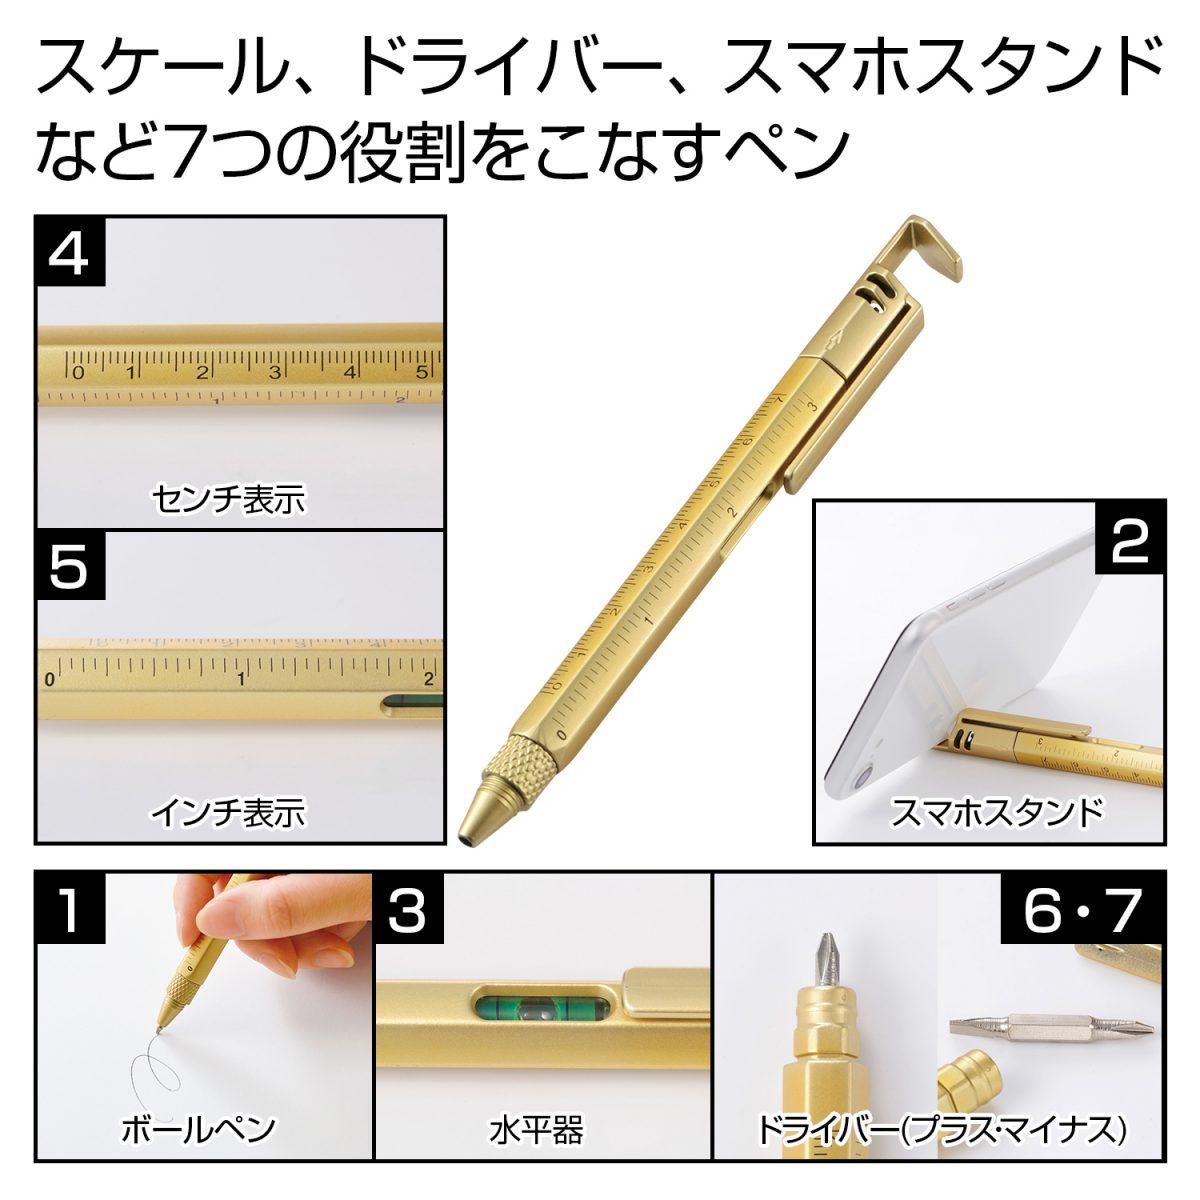 7in1多機能ツールペン(ゴールド)